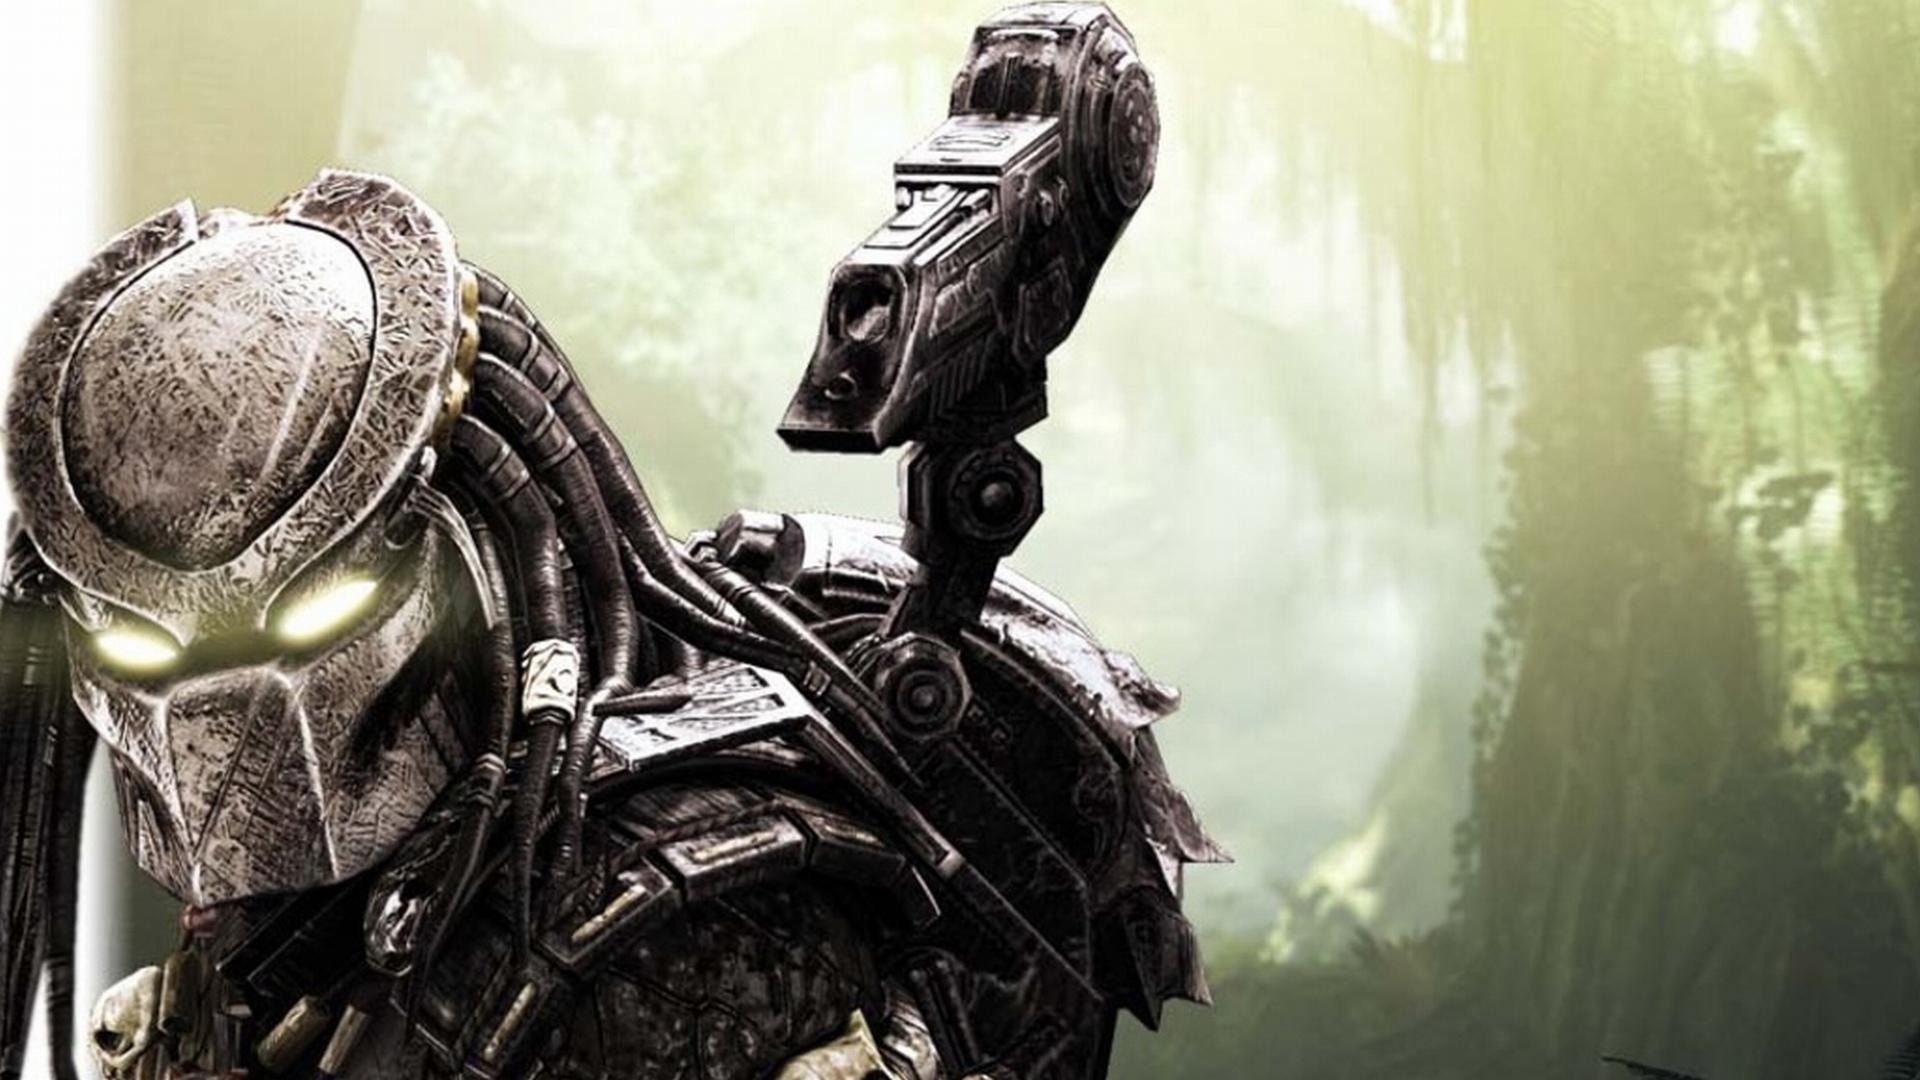 Predator Sci Fi wallpapers HD quality